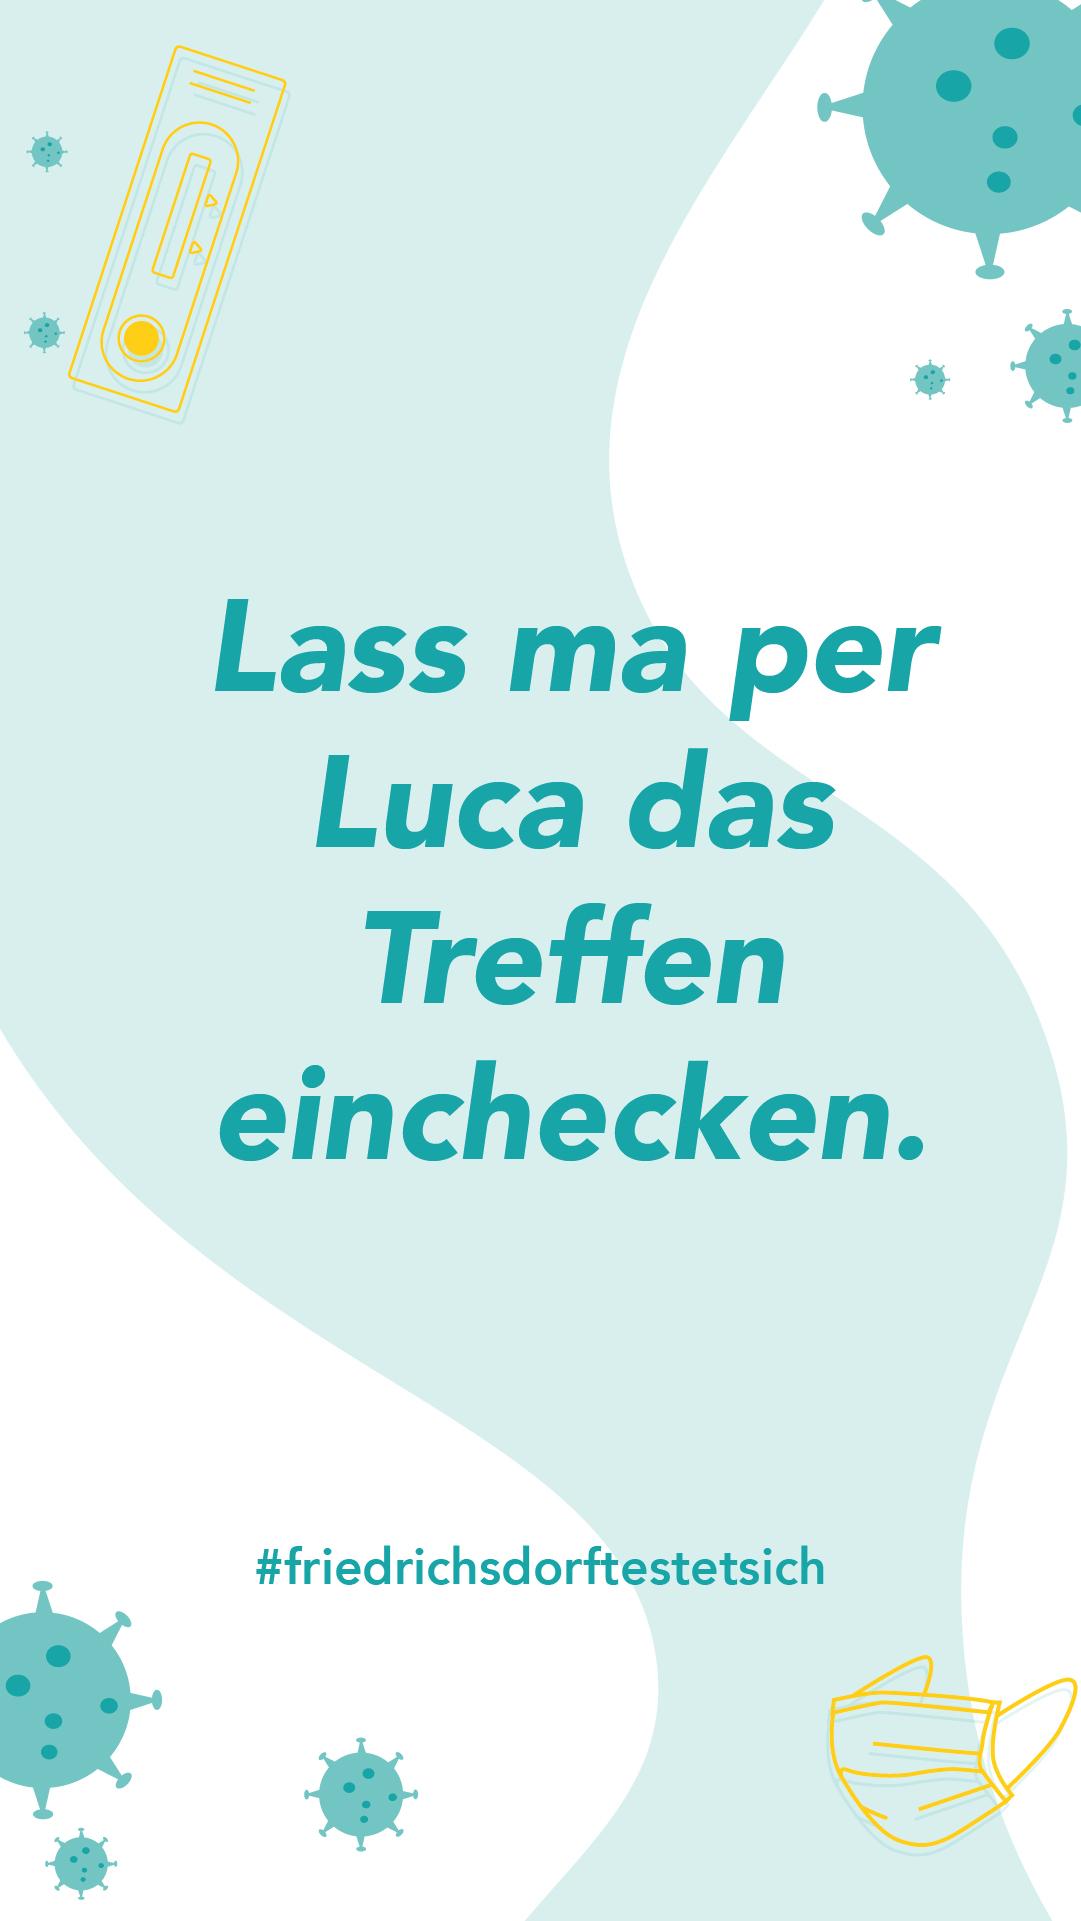 lass-ma-luca-einchecken